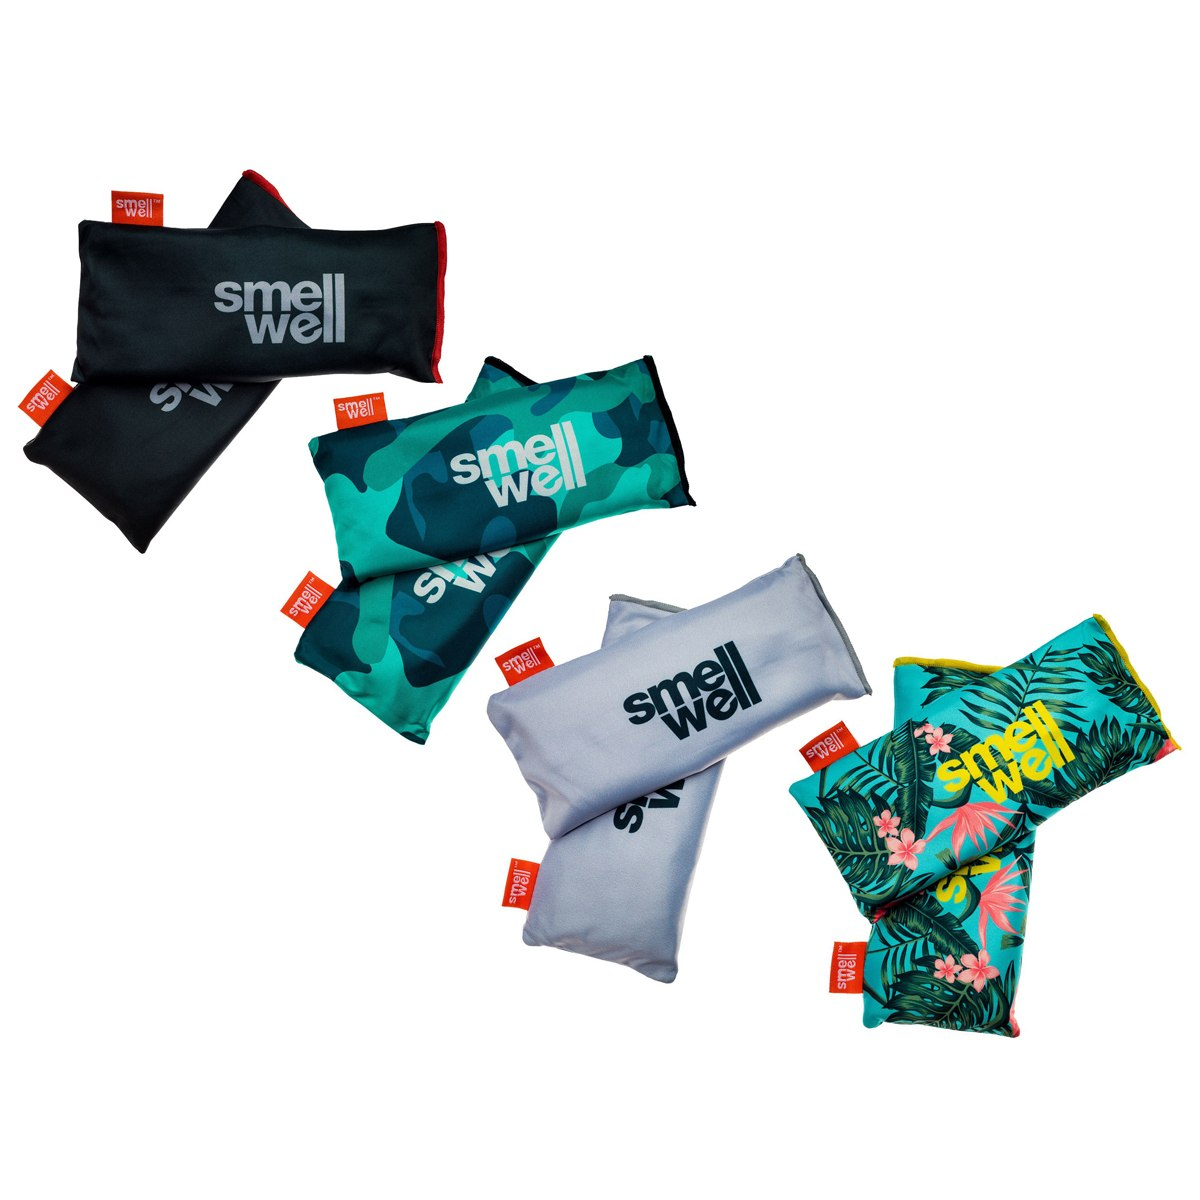 SmellWell Active XL - 2x Shoe / Textile Freshener